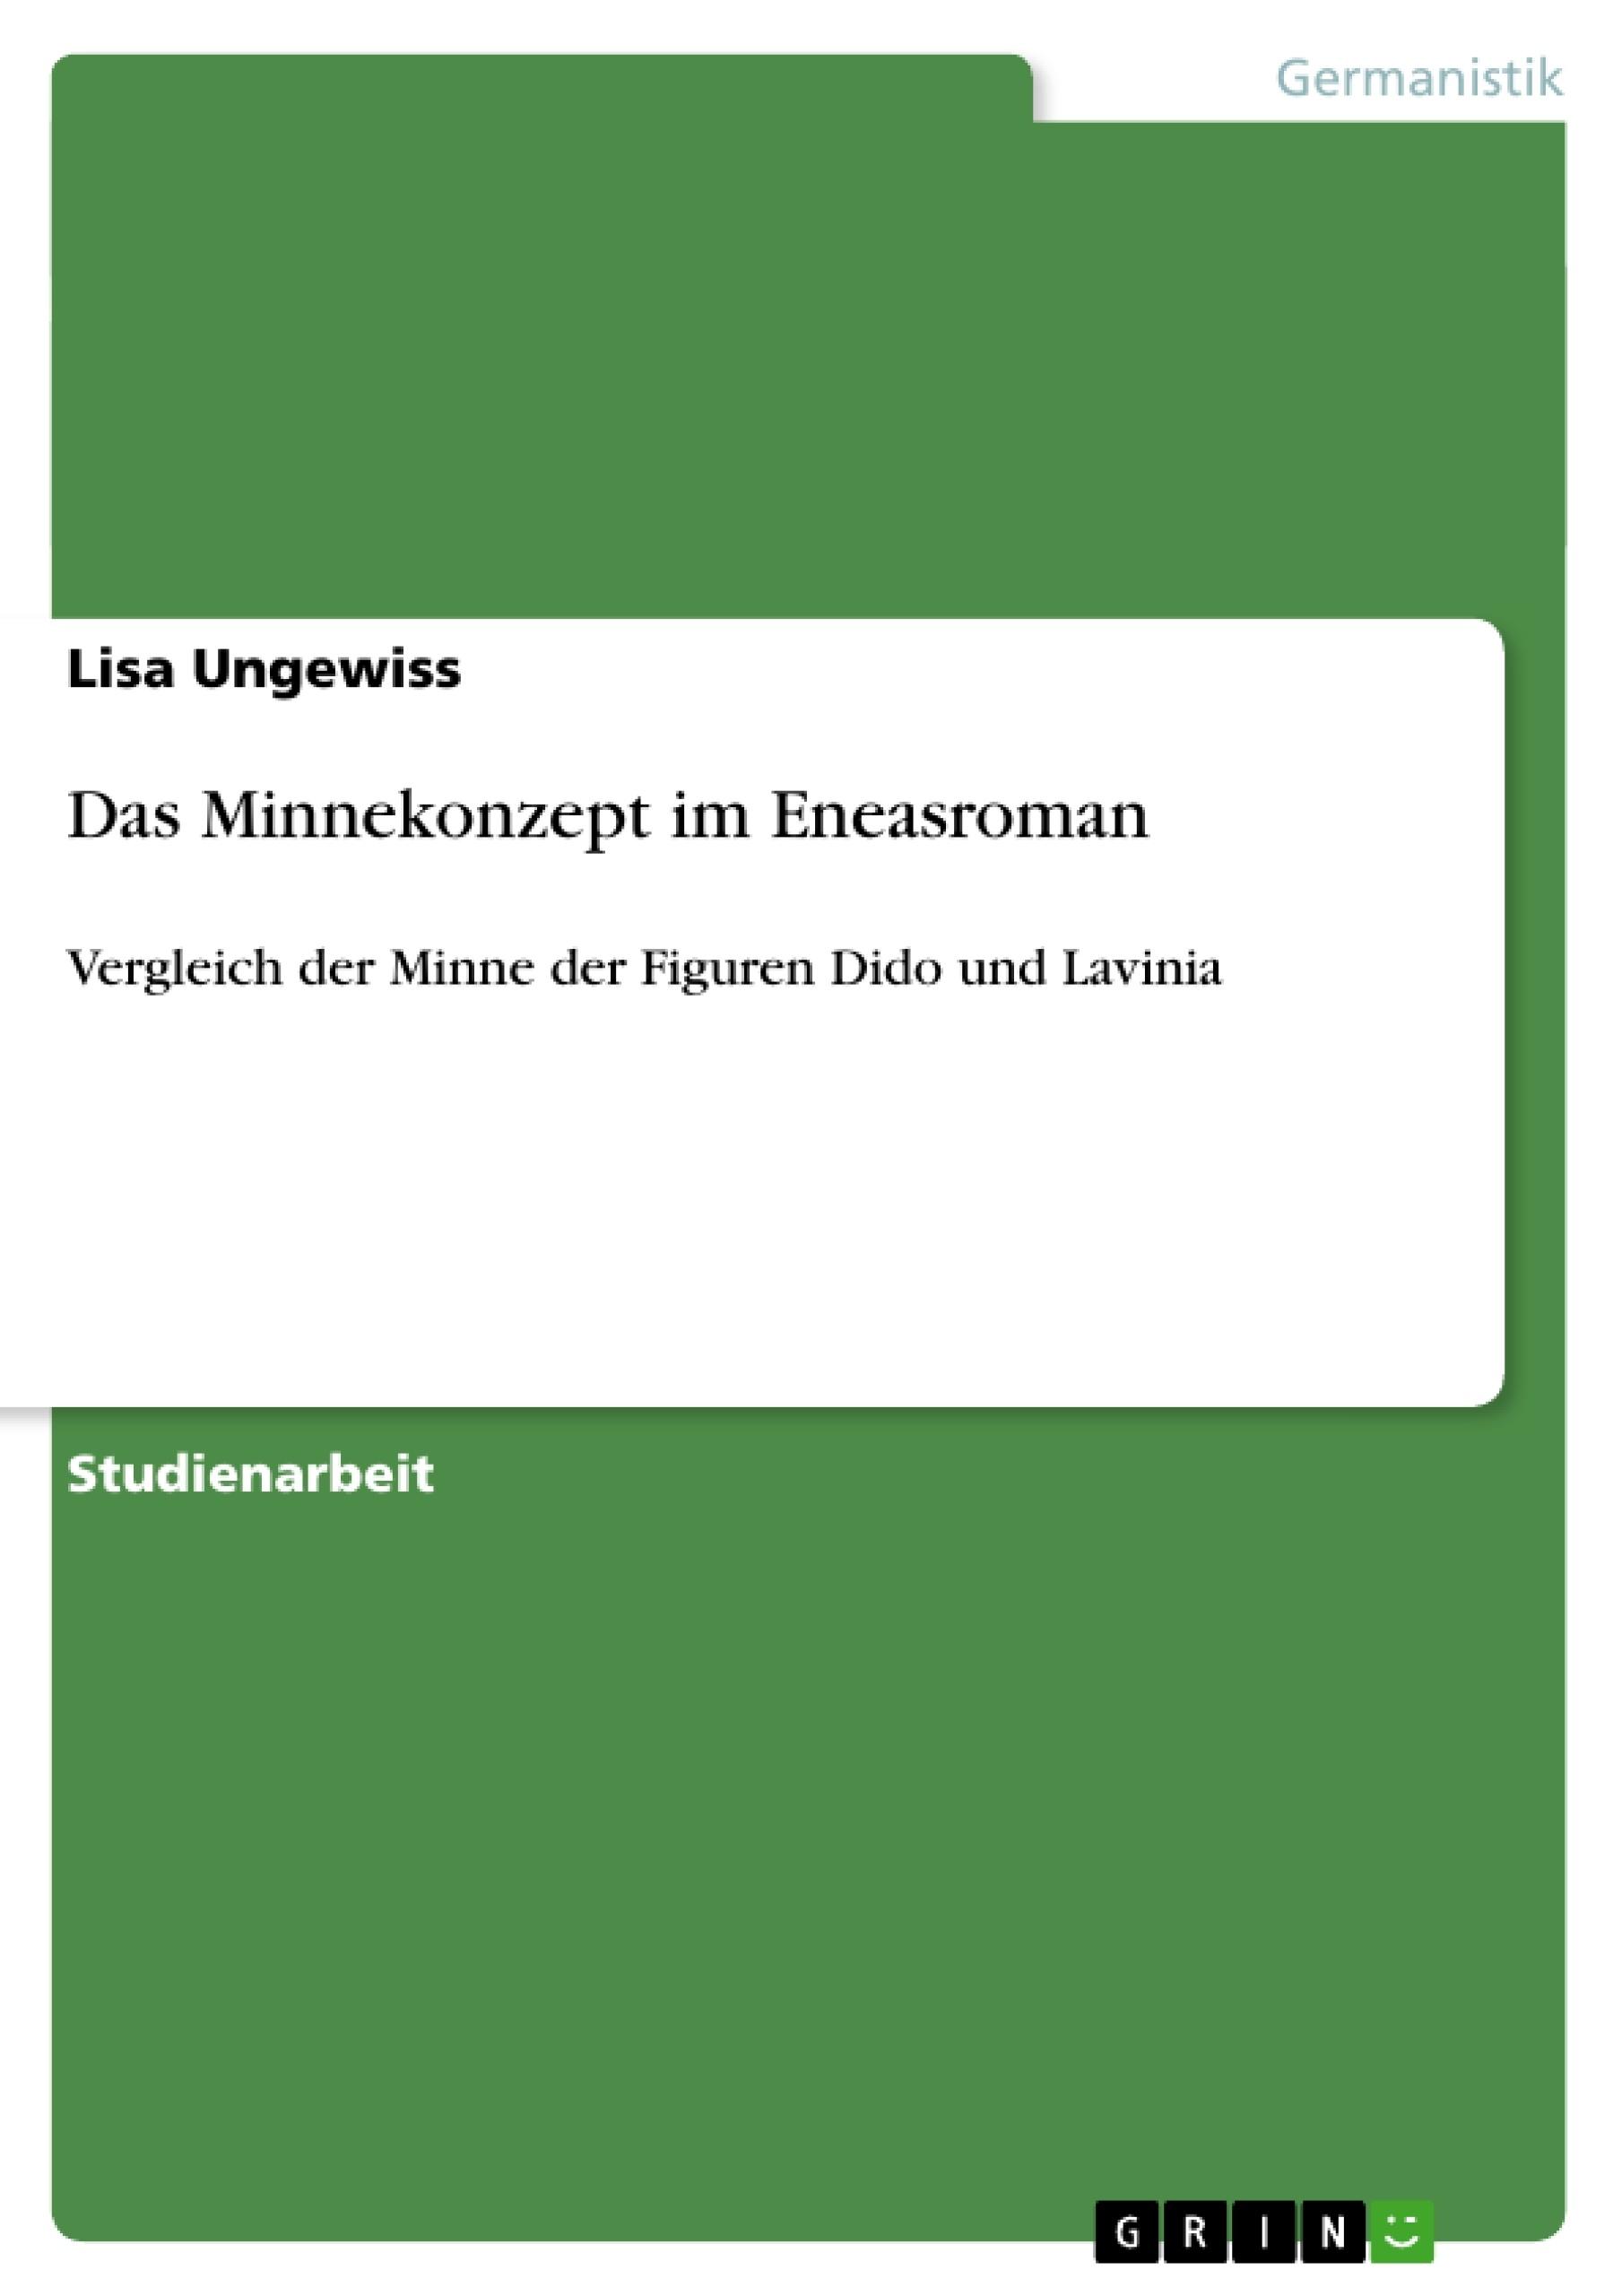 Titel: Das Minnekonzept im Eneasroman